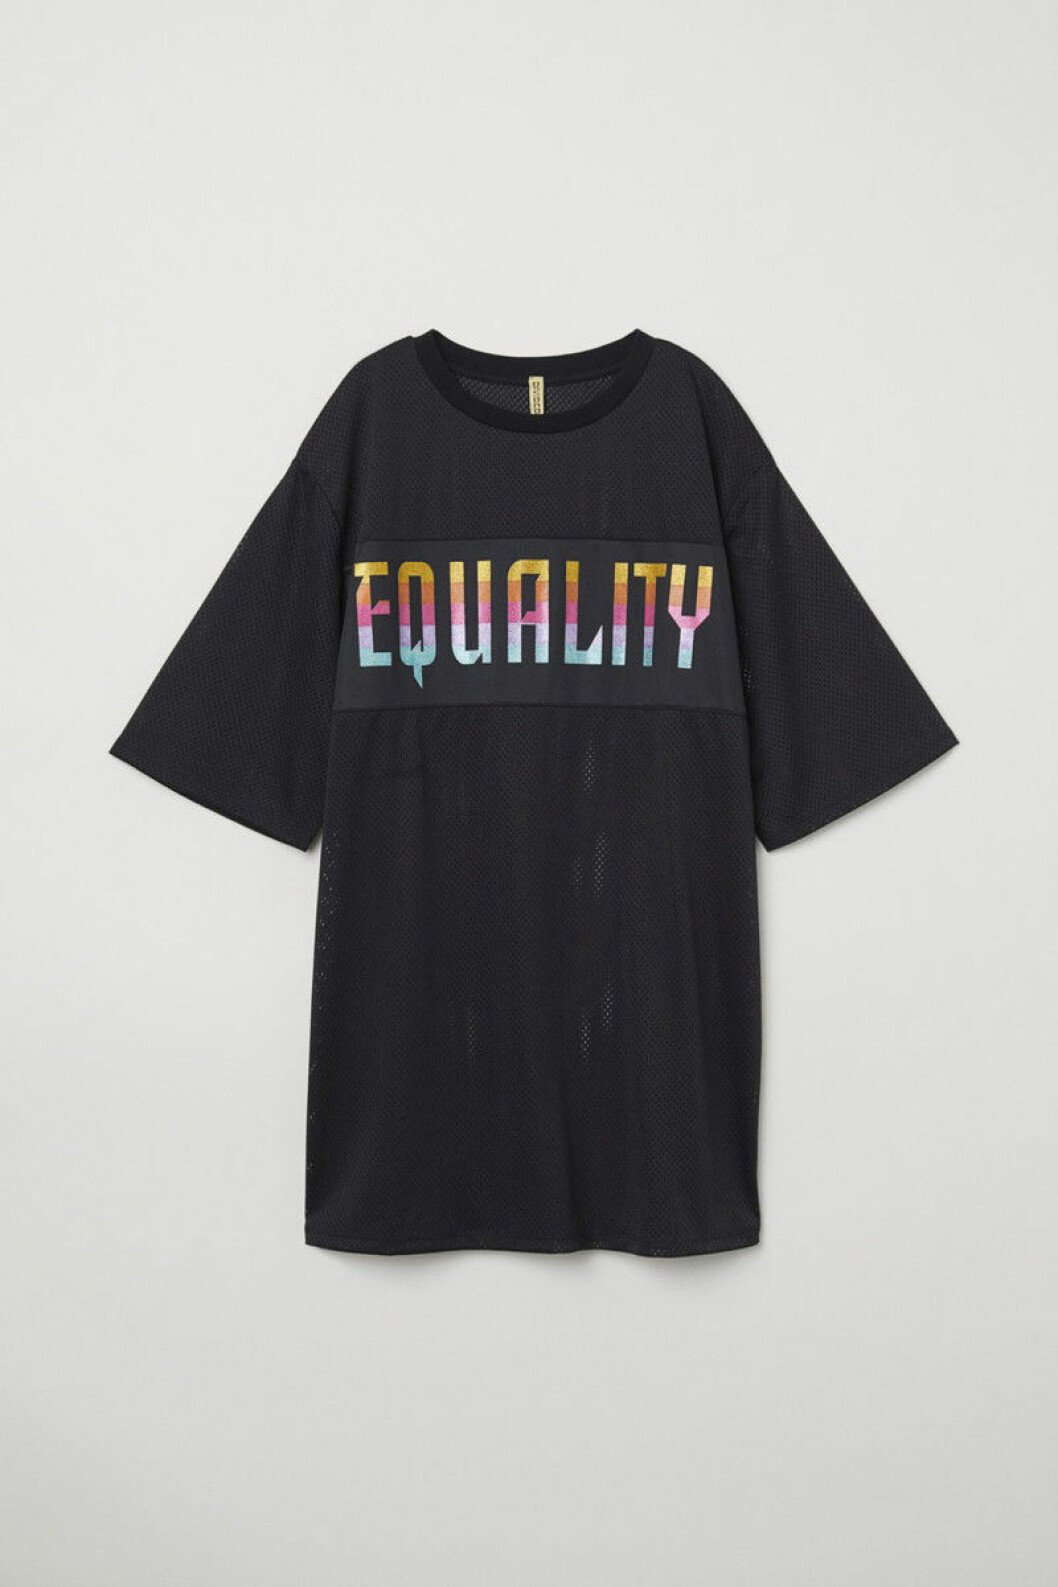 T-shirt, proud out loud, H&M pride-kollektion.